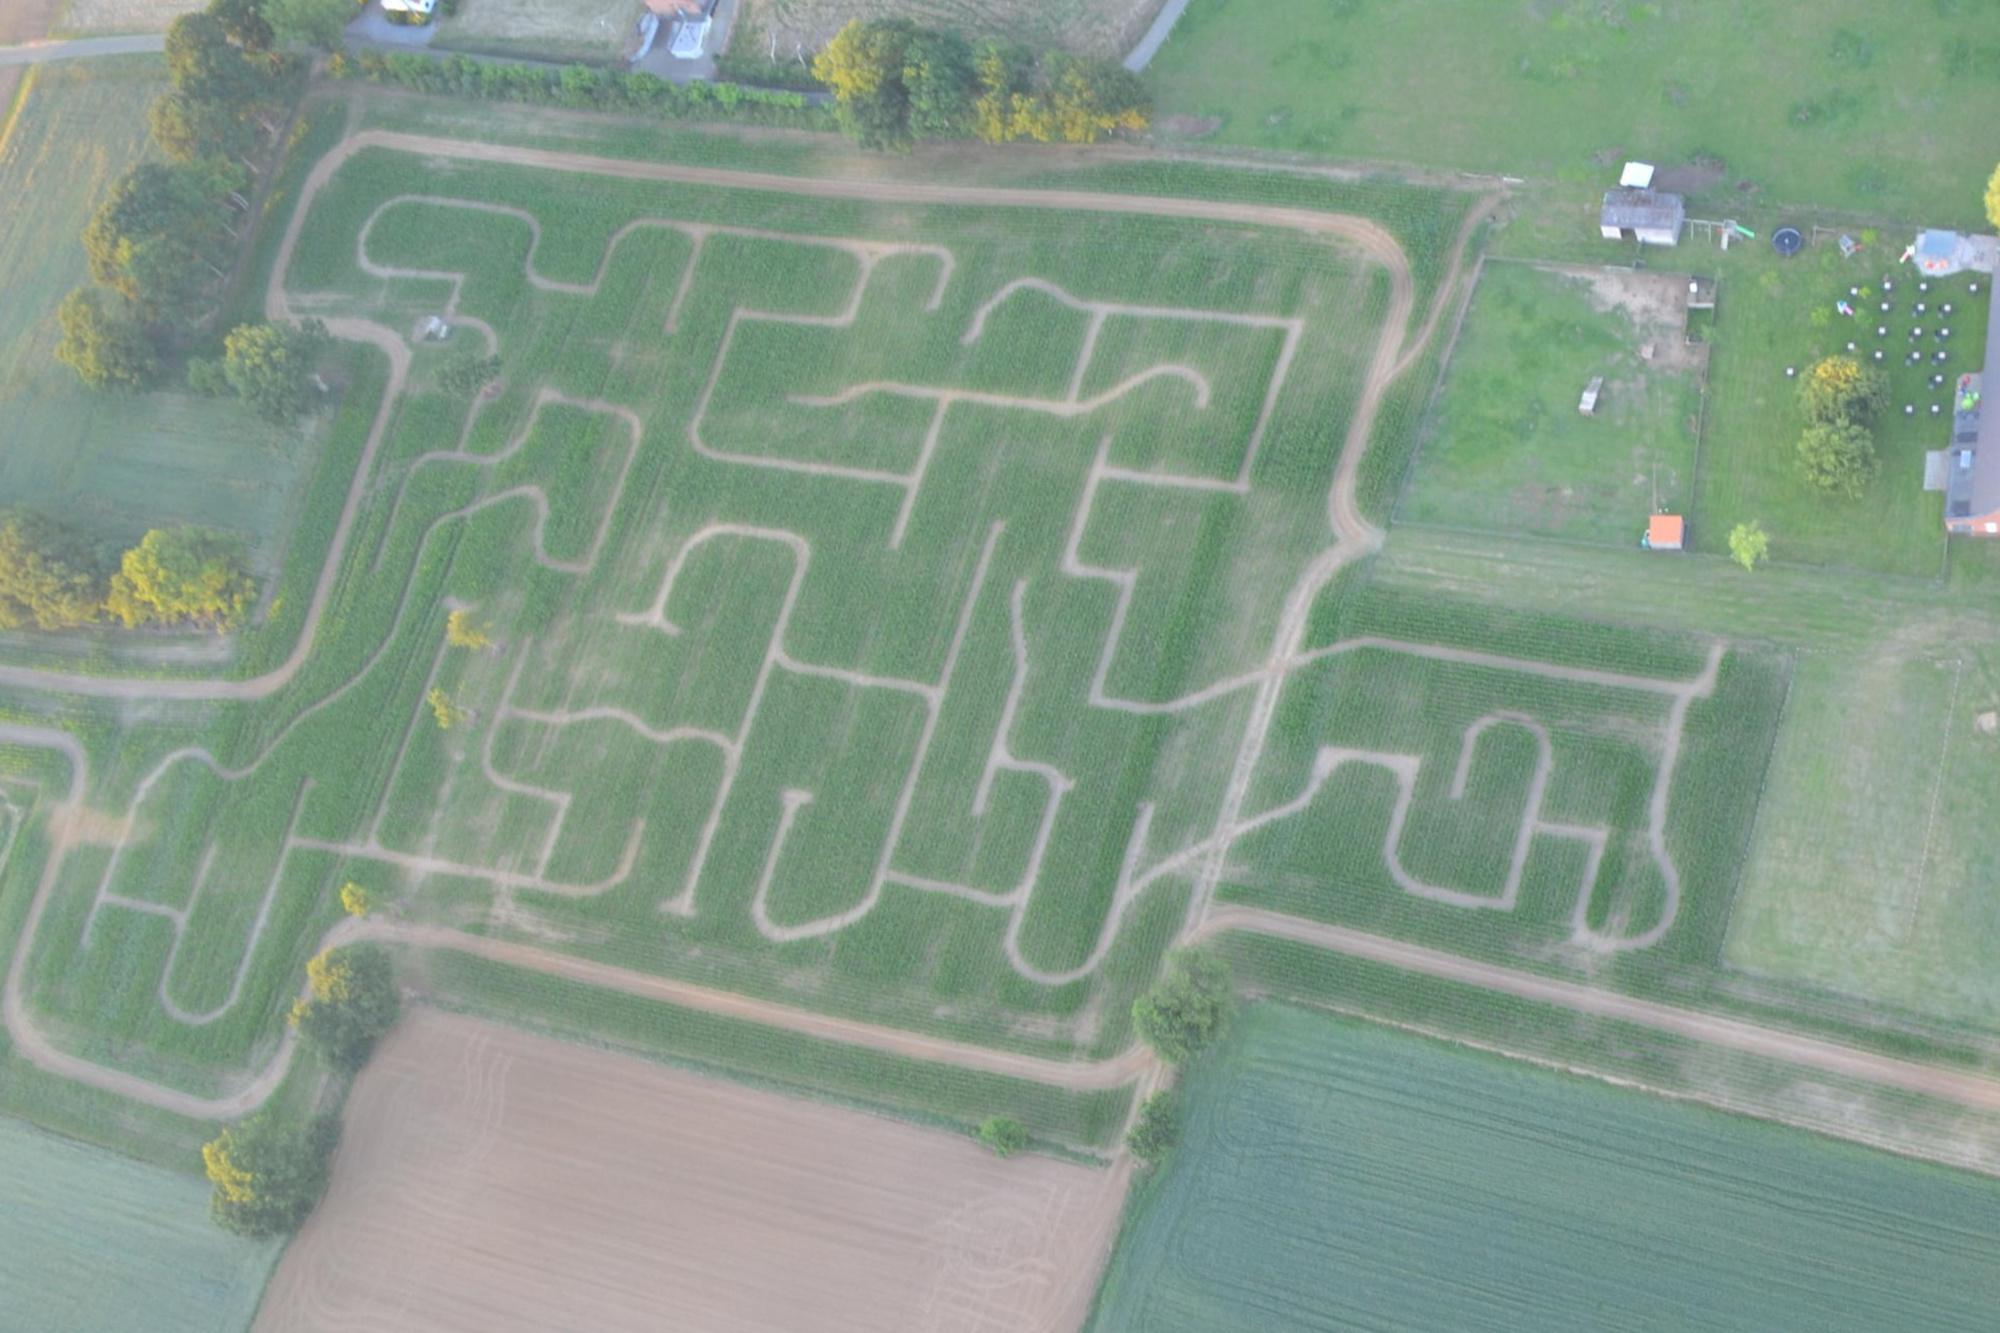 Het fietspad loopt rond het maïsdoolhof, Visit Limburg